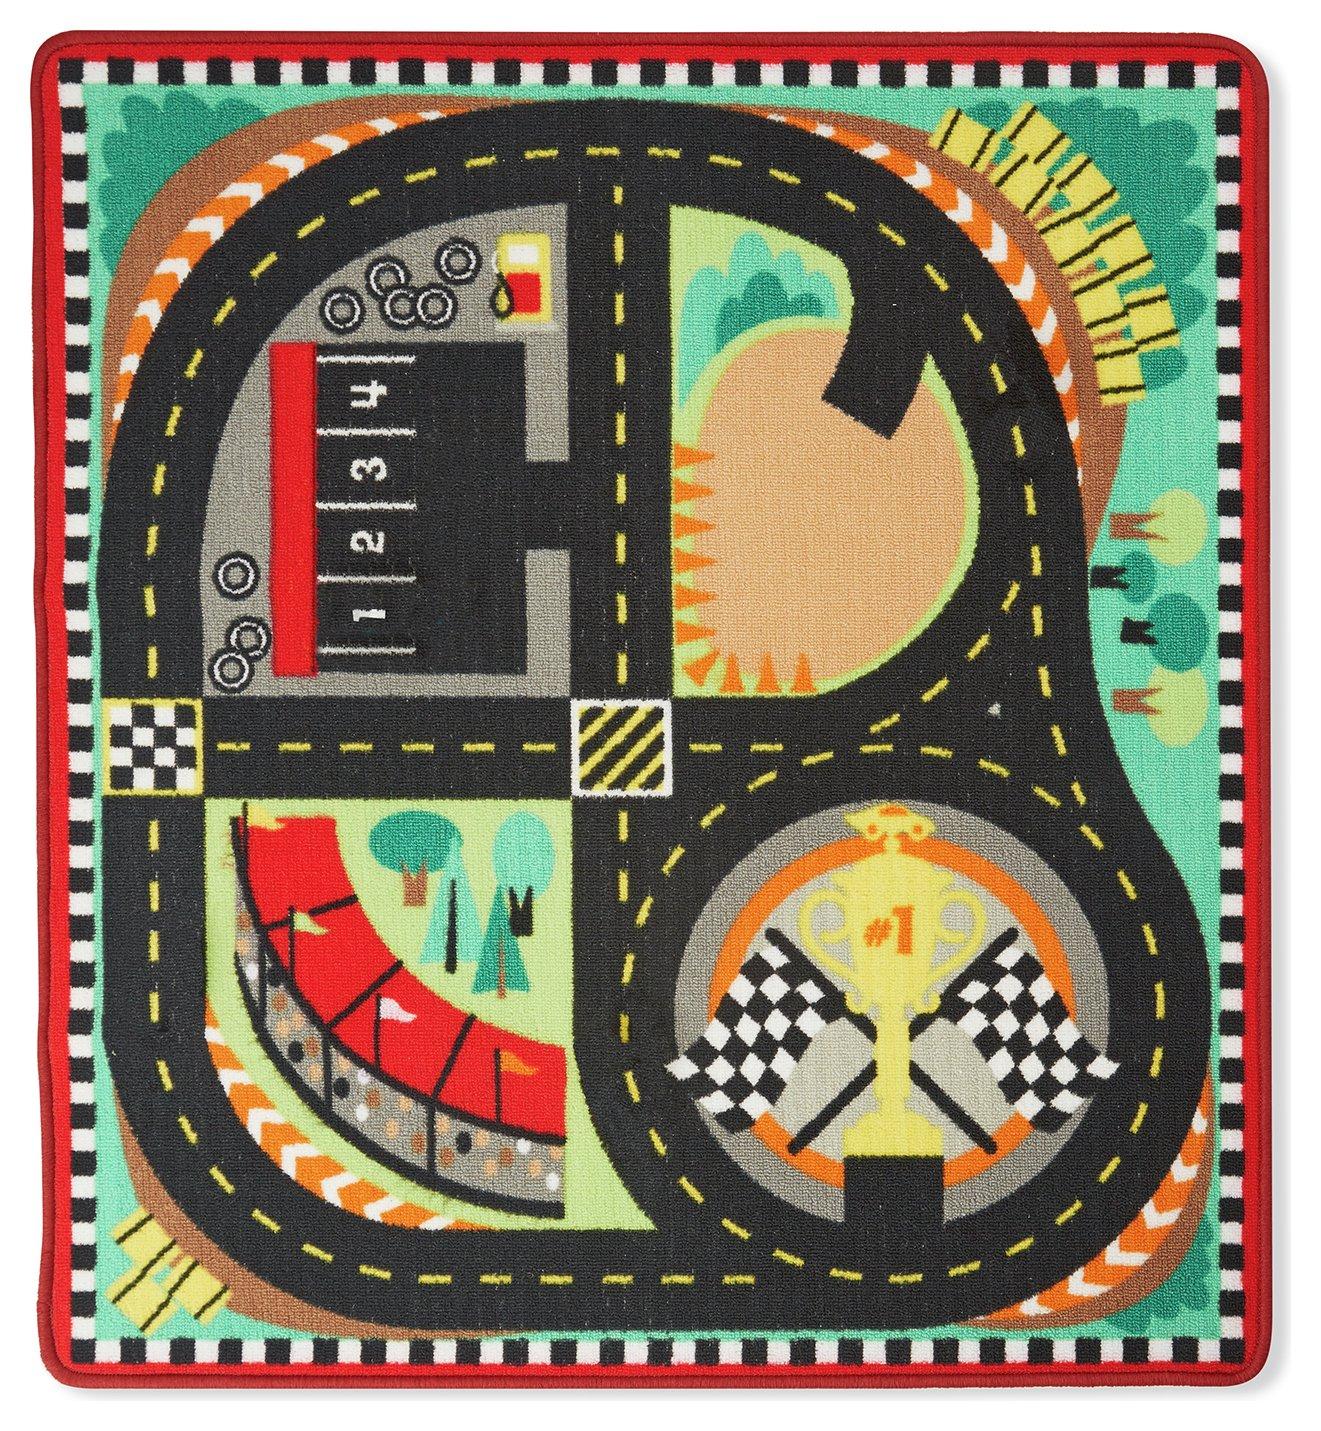 melissa-doug-around-the-race-track-rug